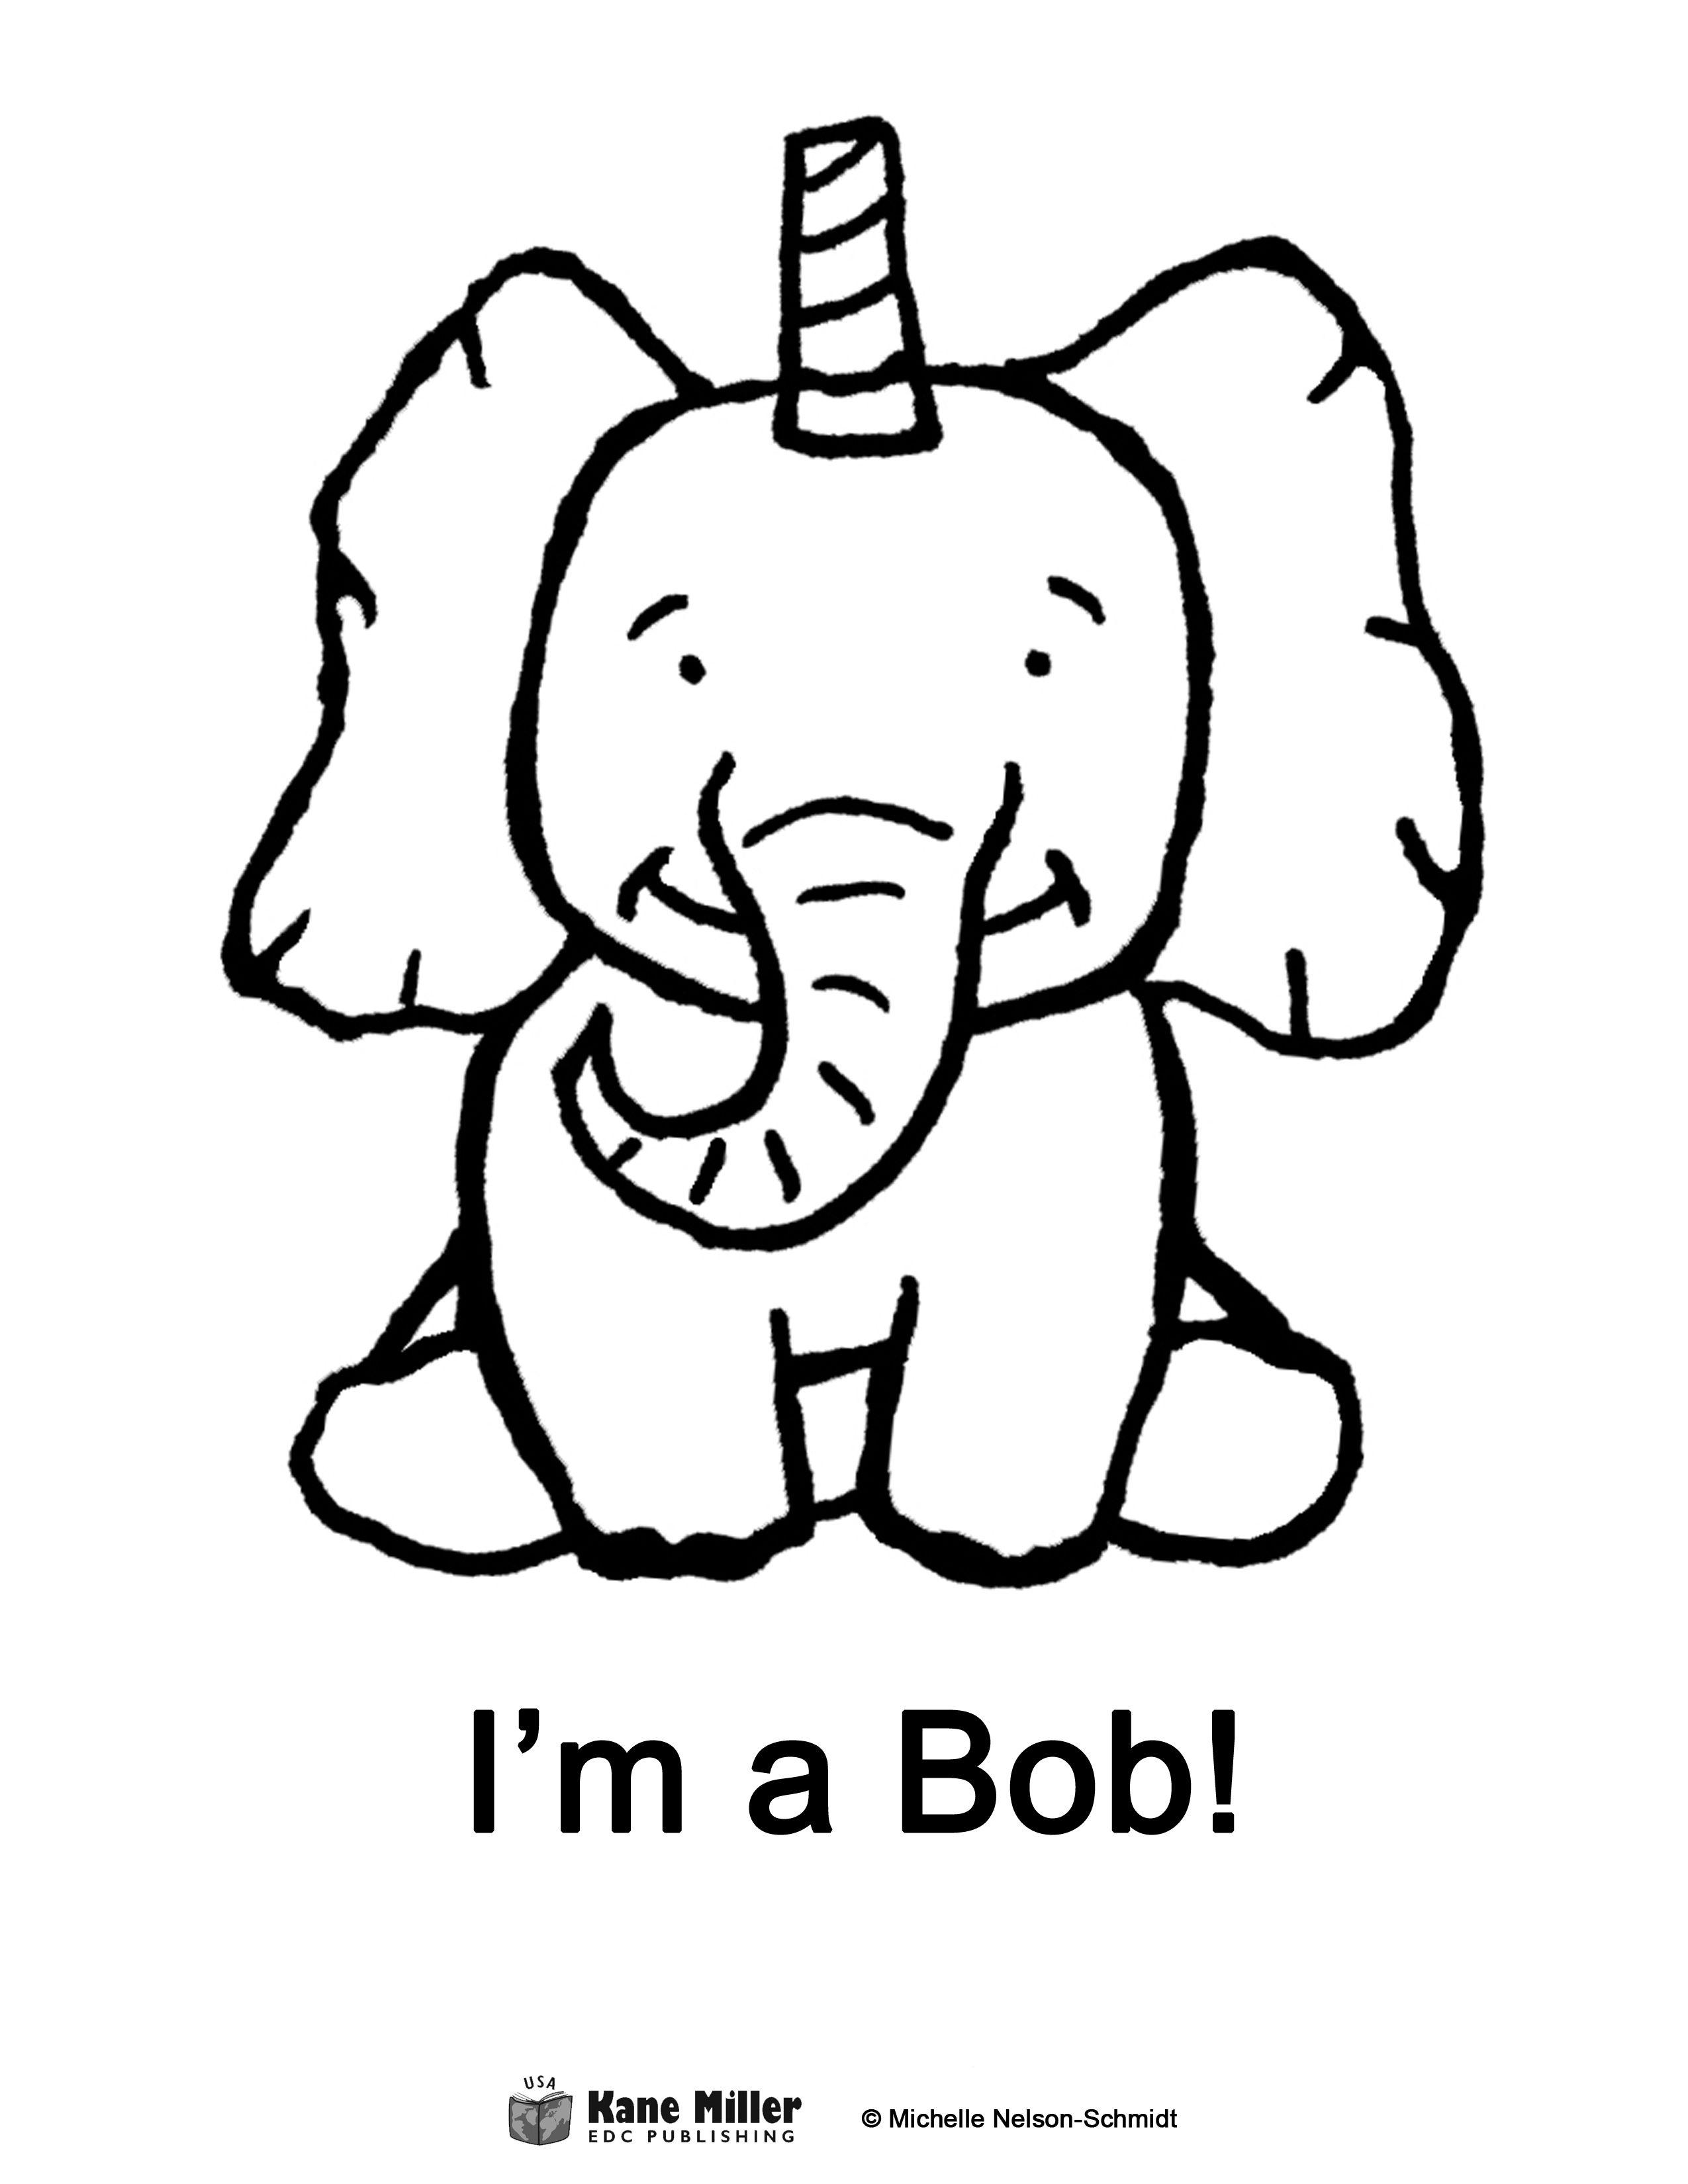 bob_coloring_book_page.jpg 2,550×3,300 pixels